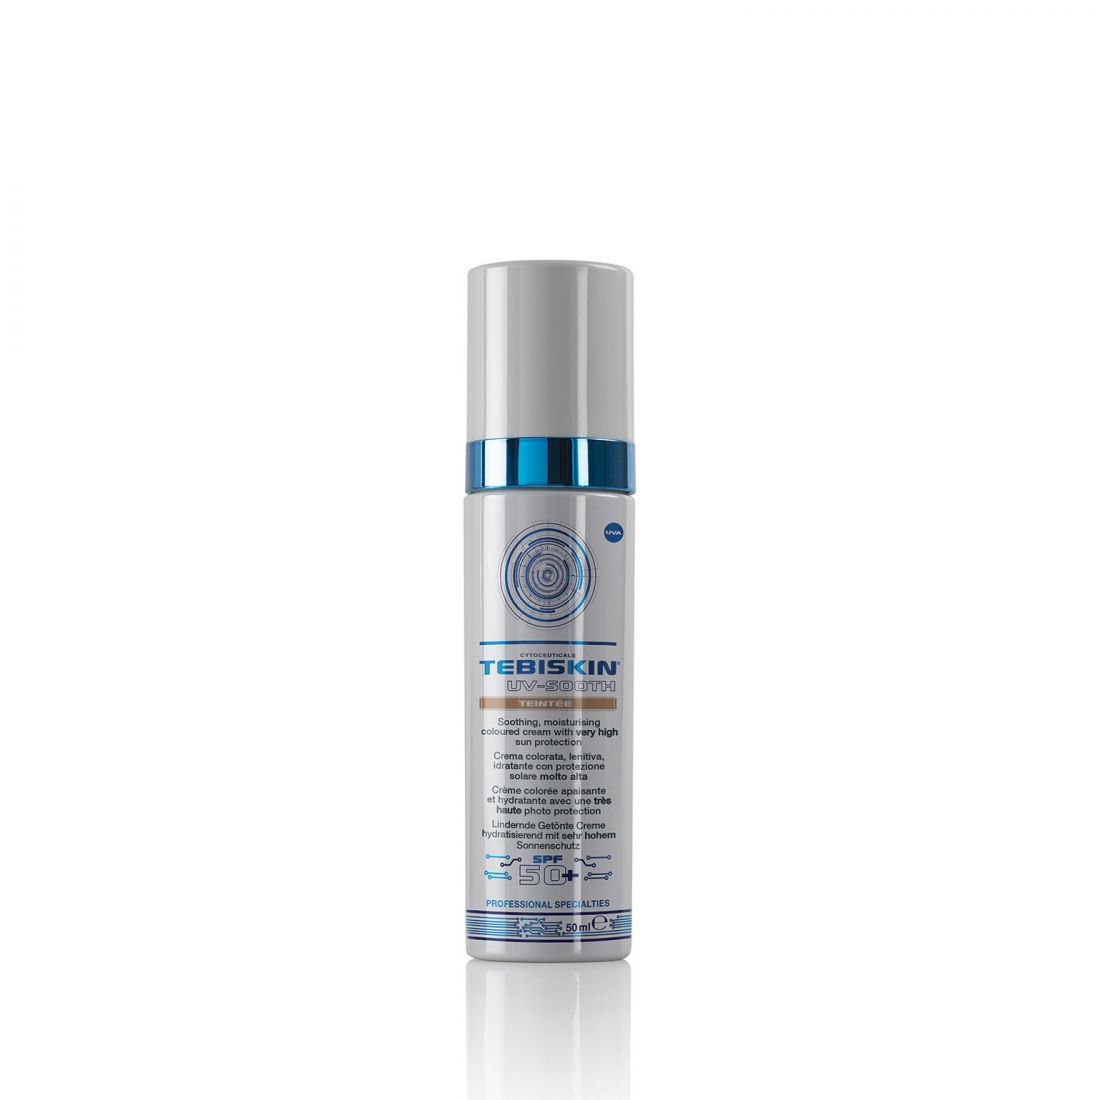 TEBISKIN UV-Sooth Teintee SPF 50 Тонирующий успокаивающий крем с SPF 50+